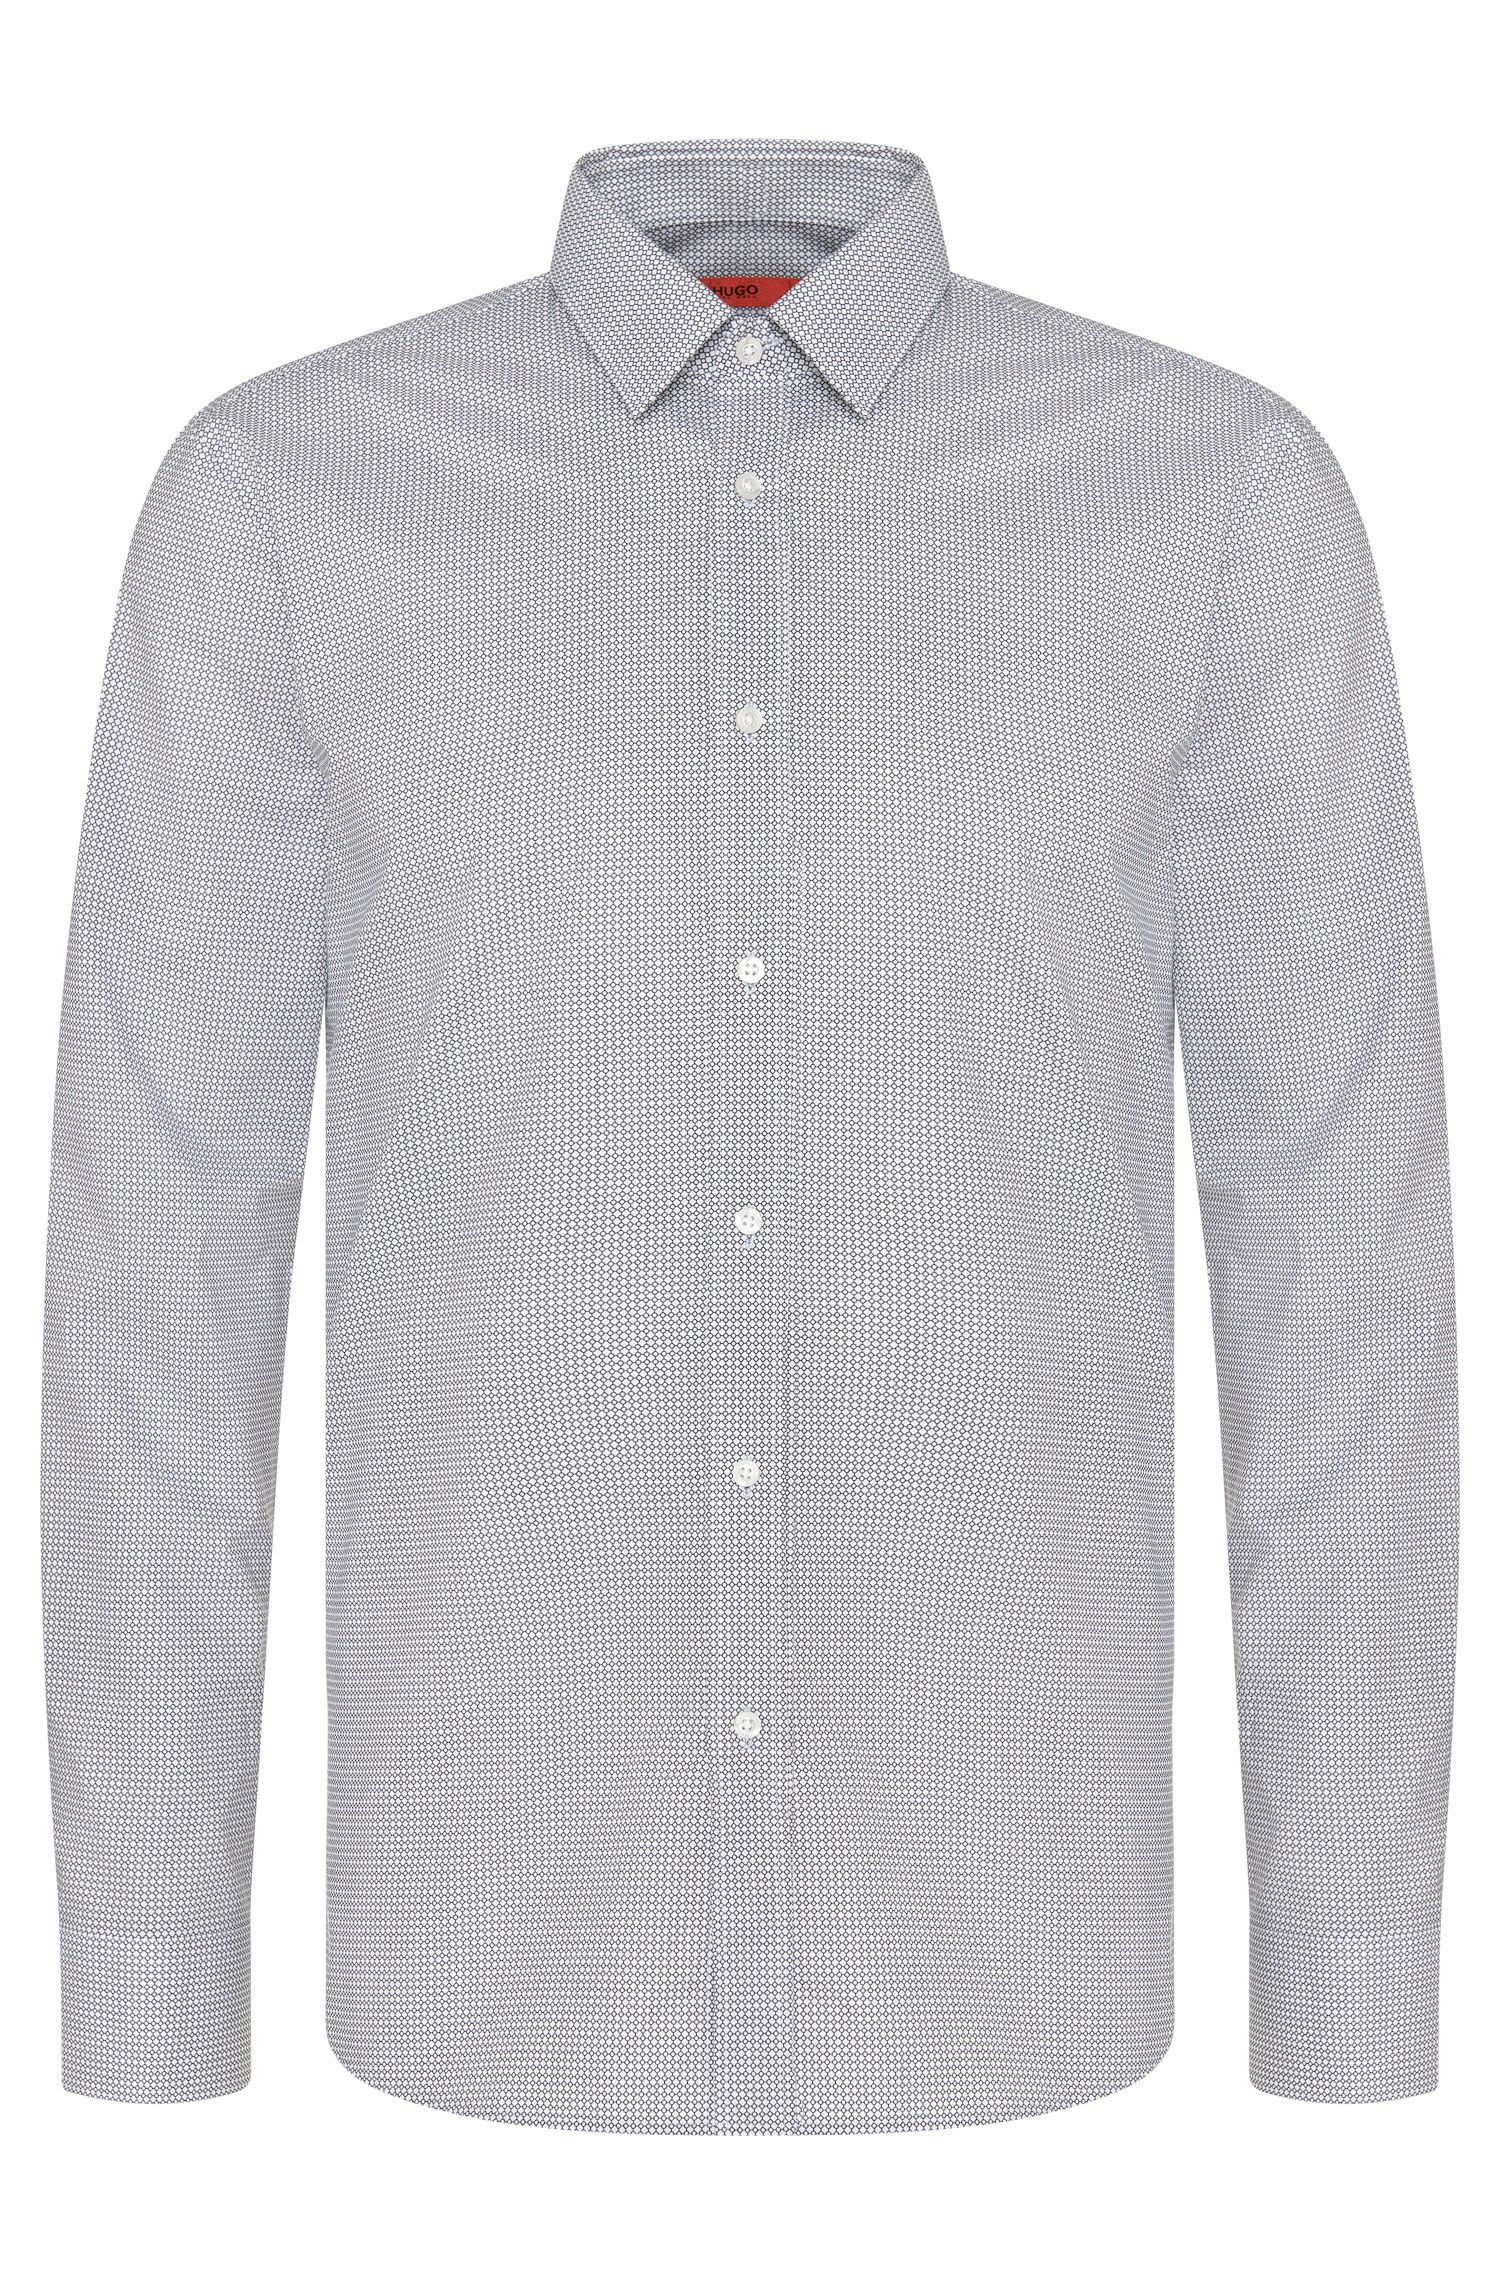 Gemustertes Slim-Fit Hemd aus Baumwolle: 'Elisha01'